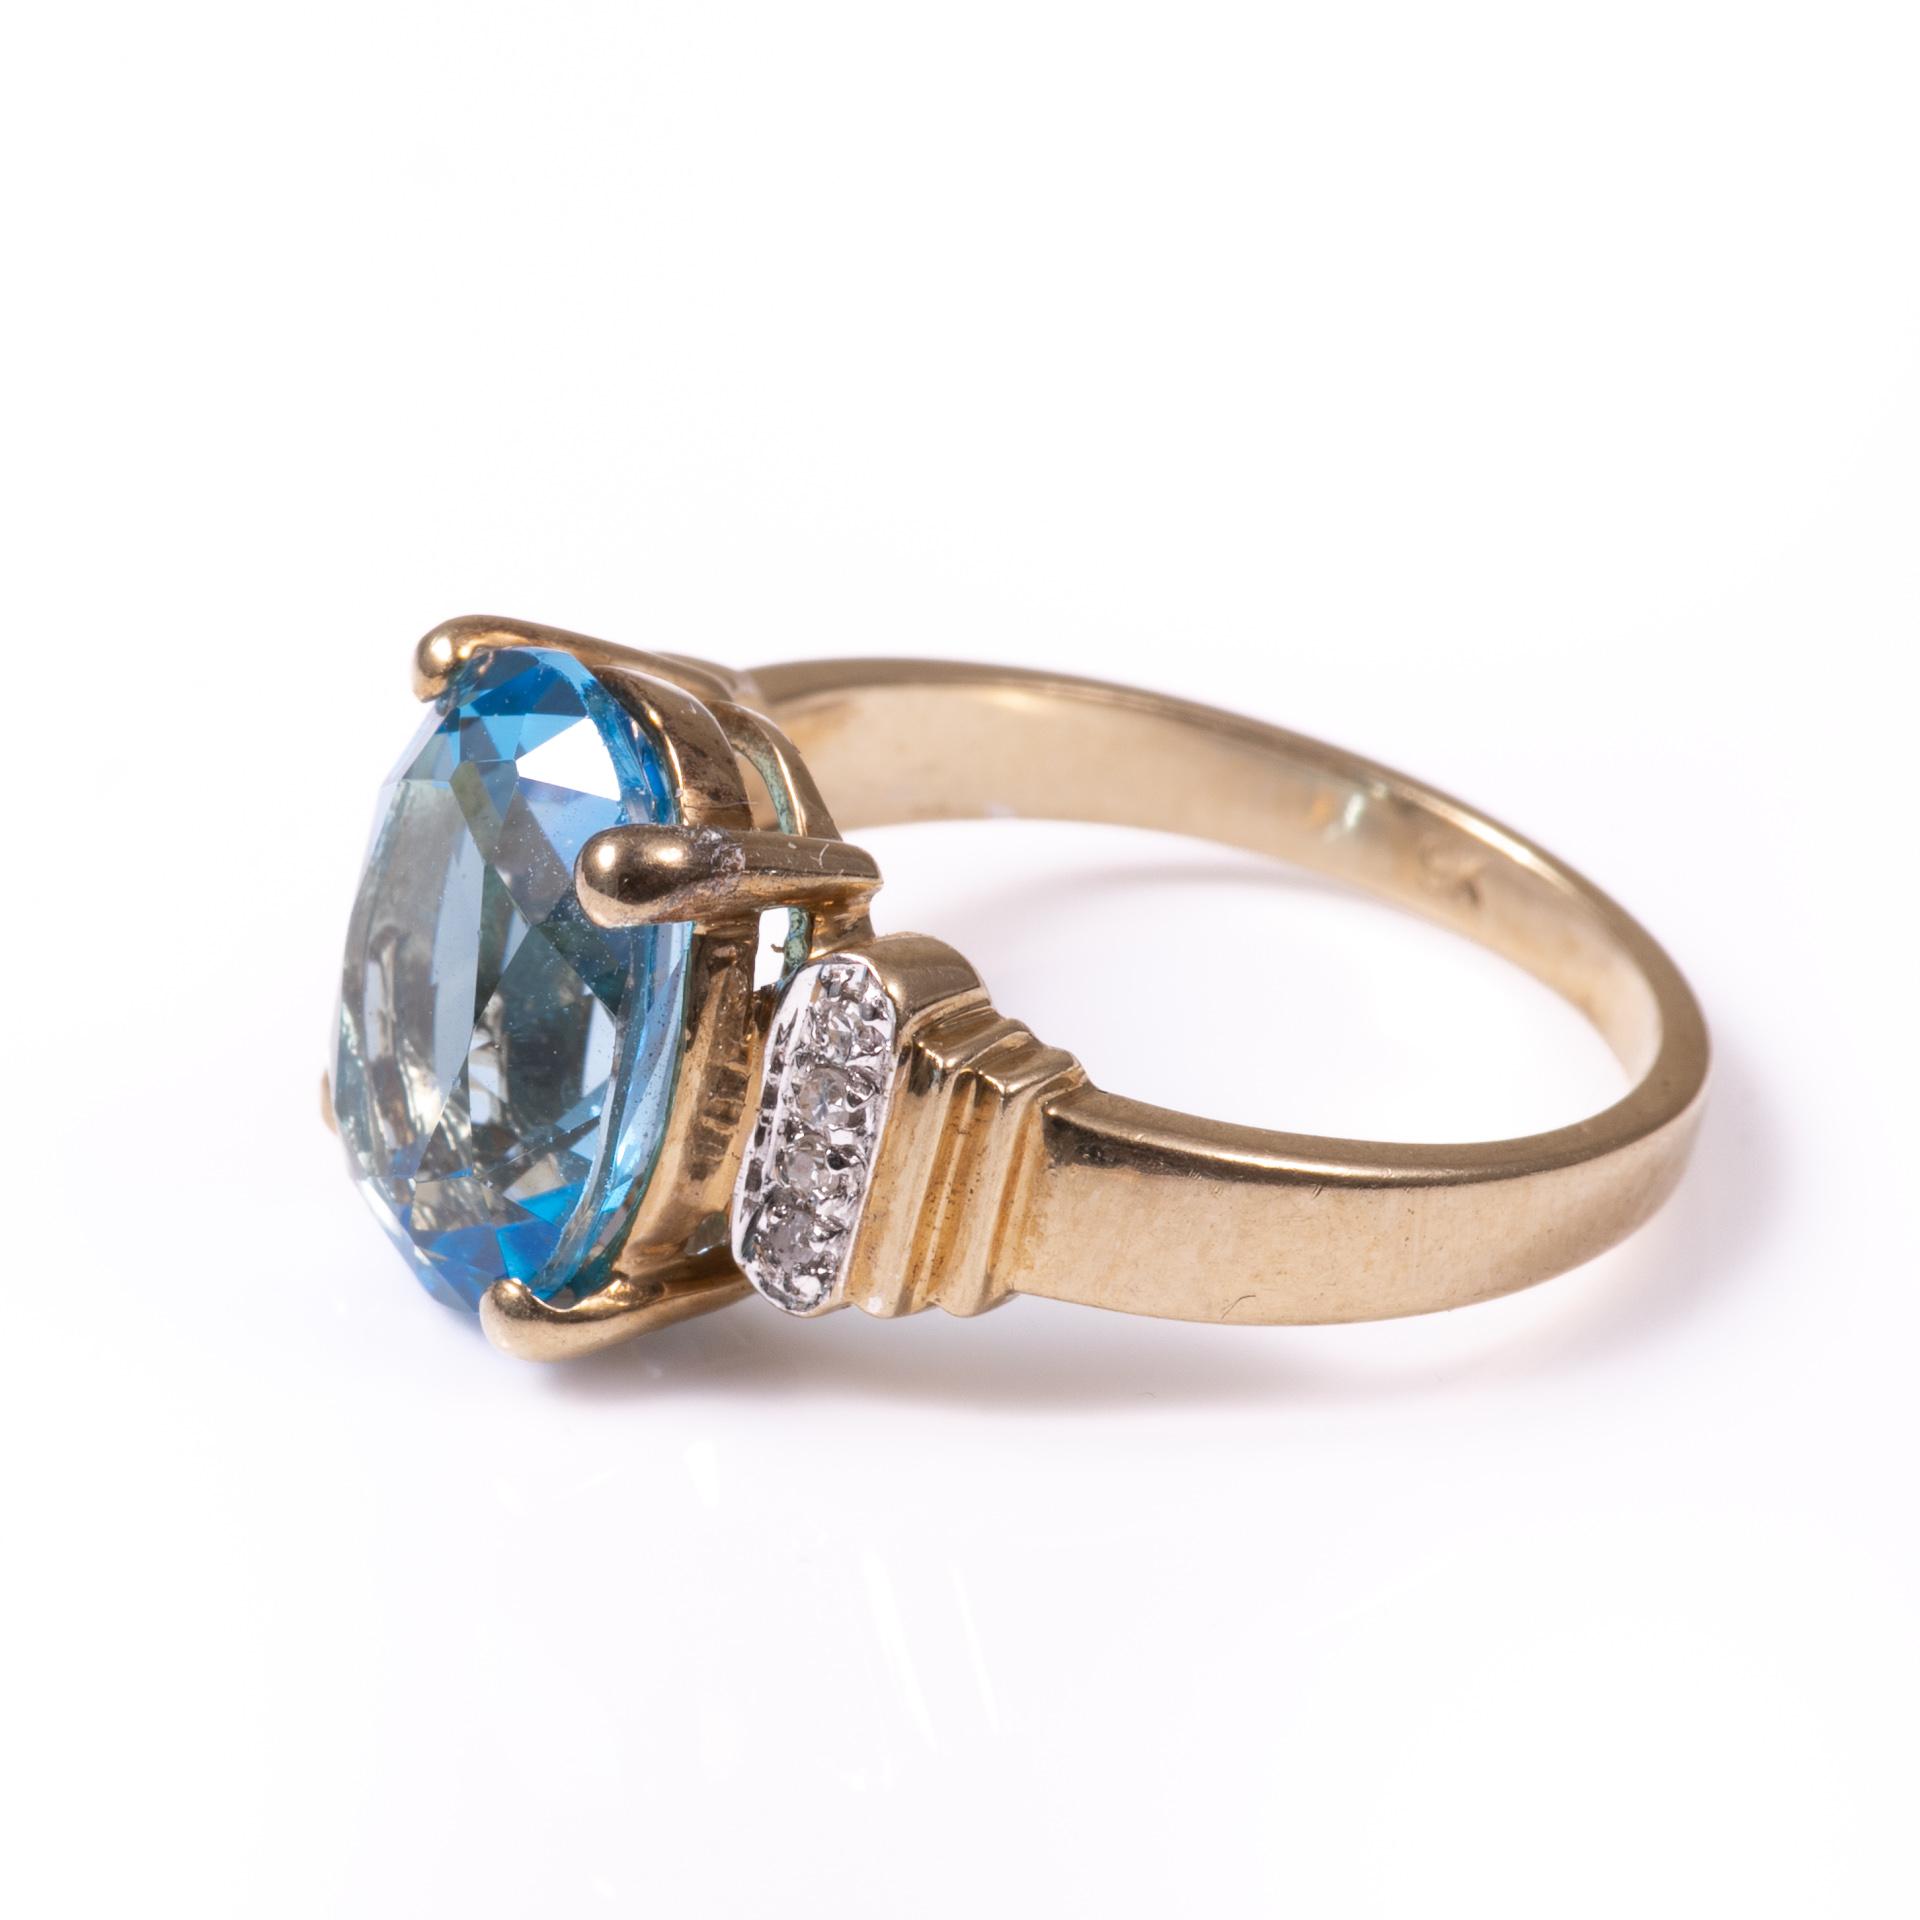 9ct Gold 4.40ct Blue Topaz & Diamond Ring - Image 3 of 6